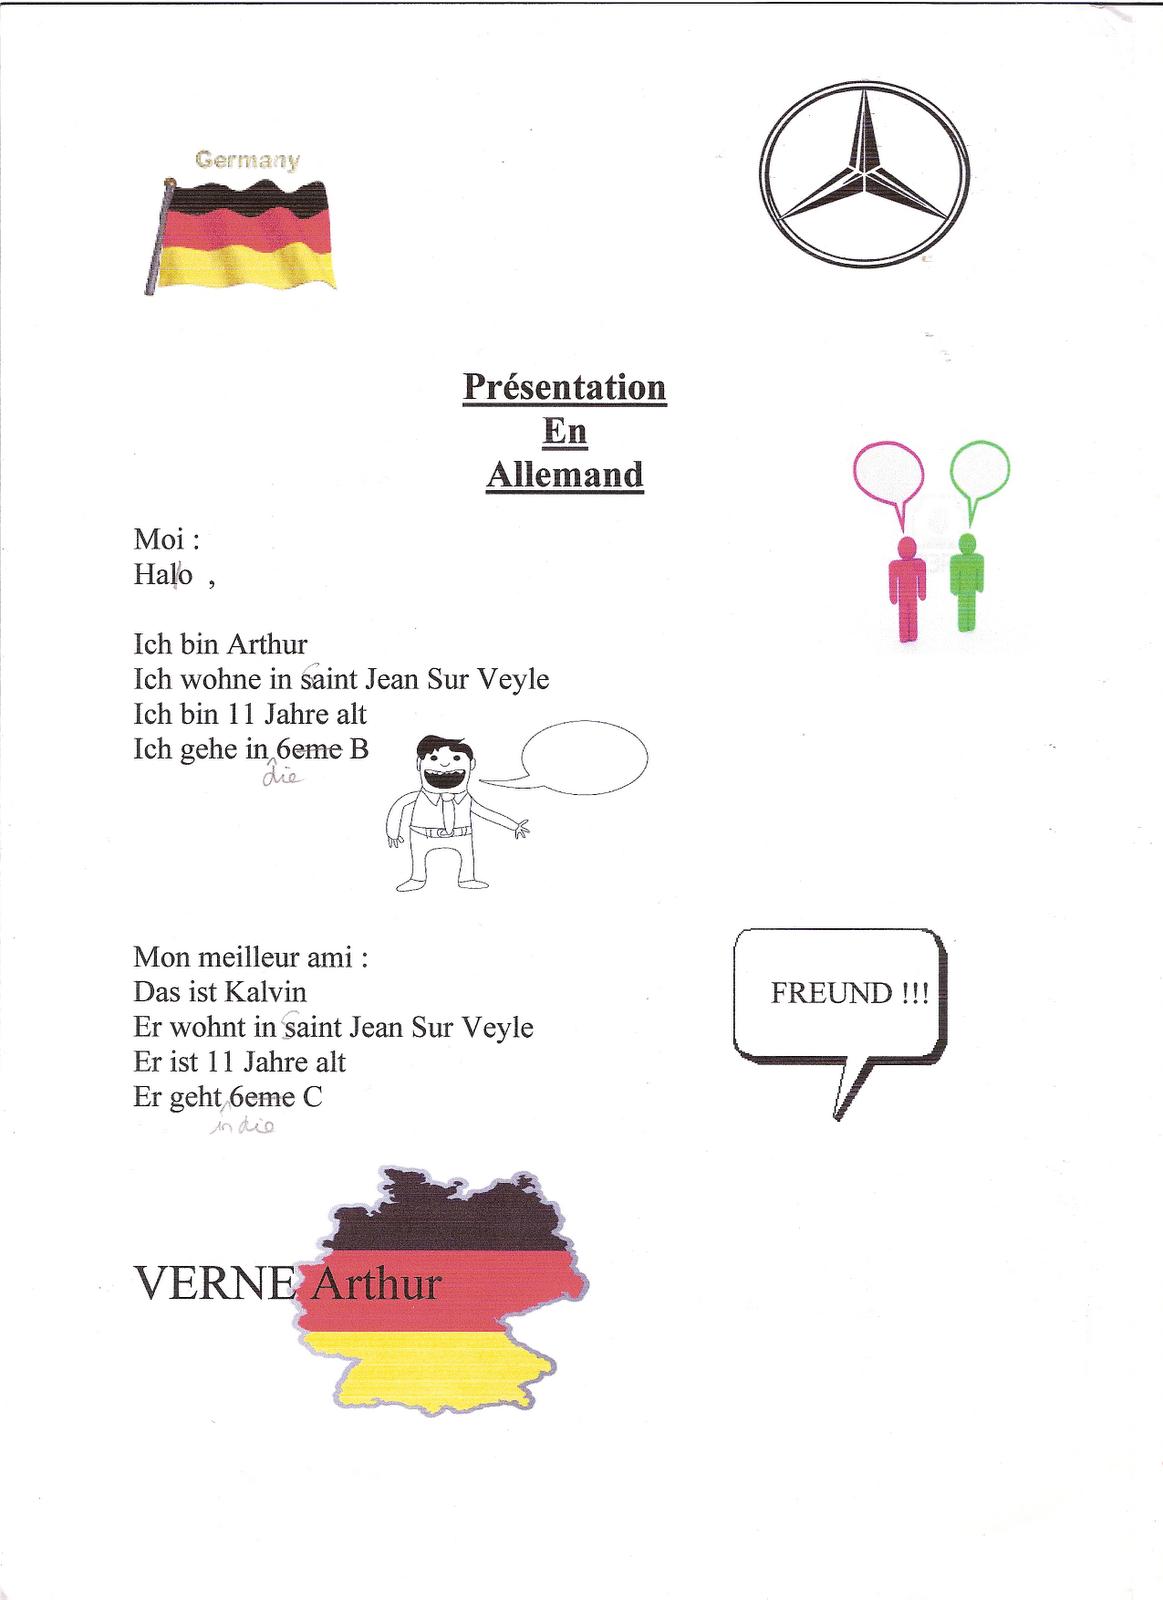 exercice allemand 6eme